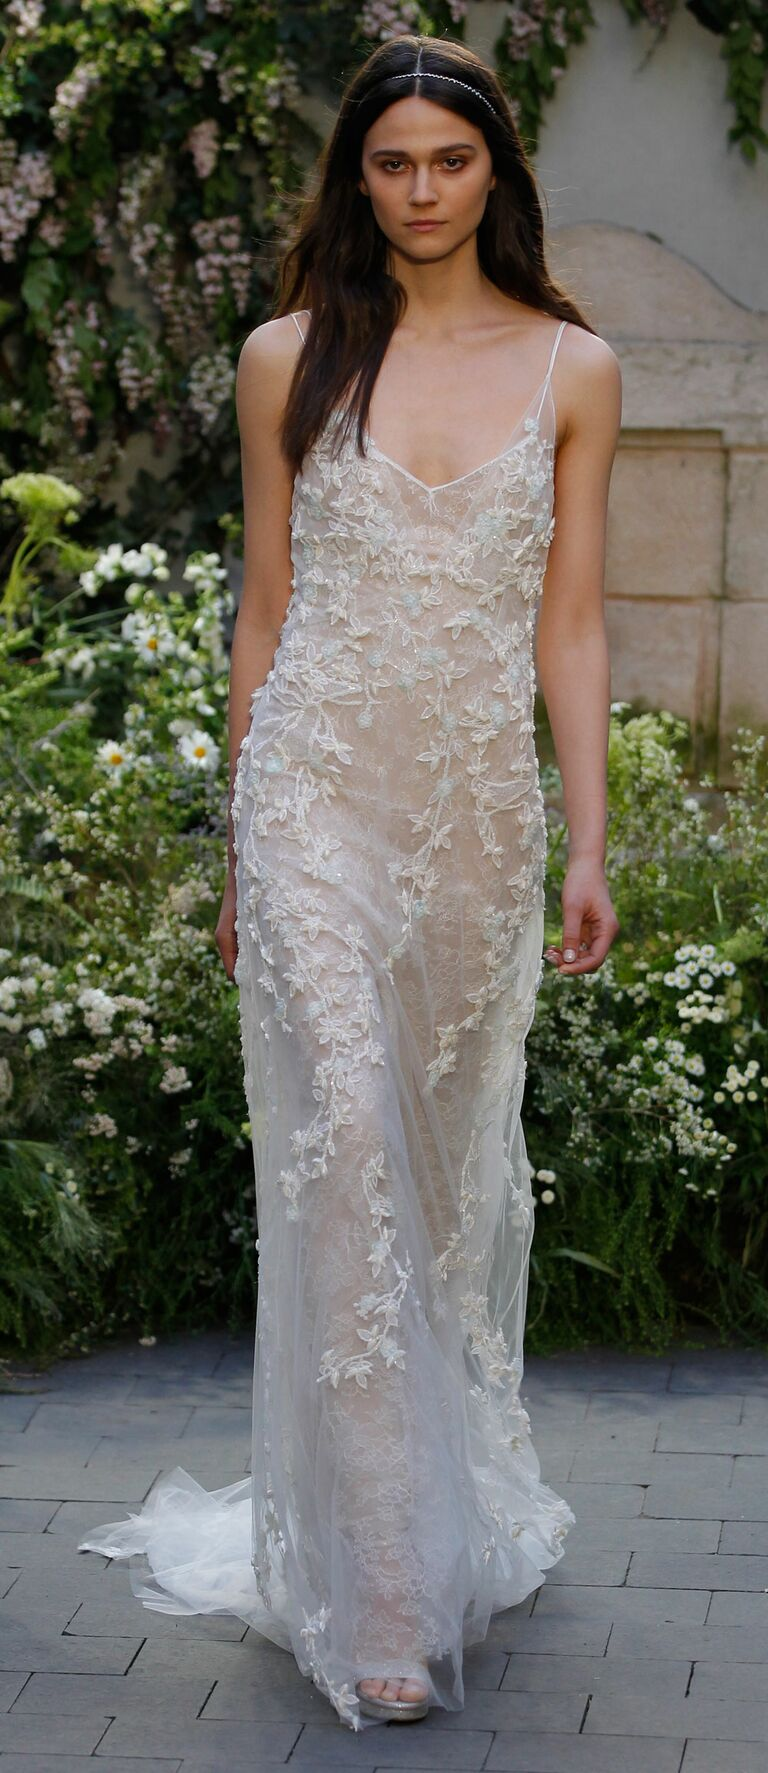 Monique Lhuillier Spring 2017 Collection: Bridal Fashion Week Photos